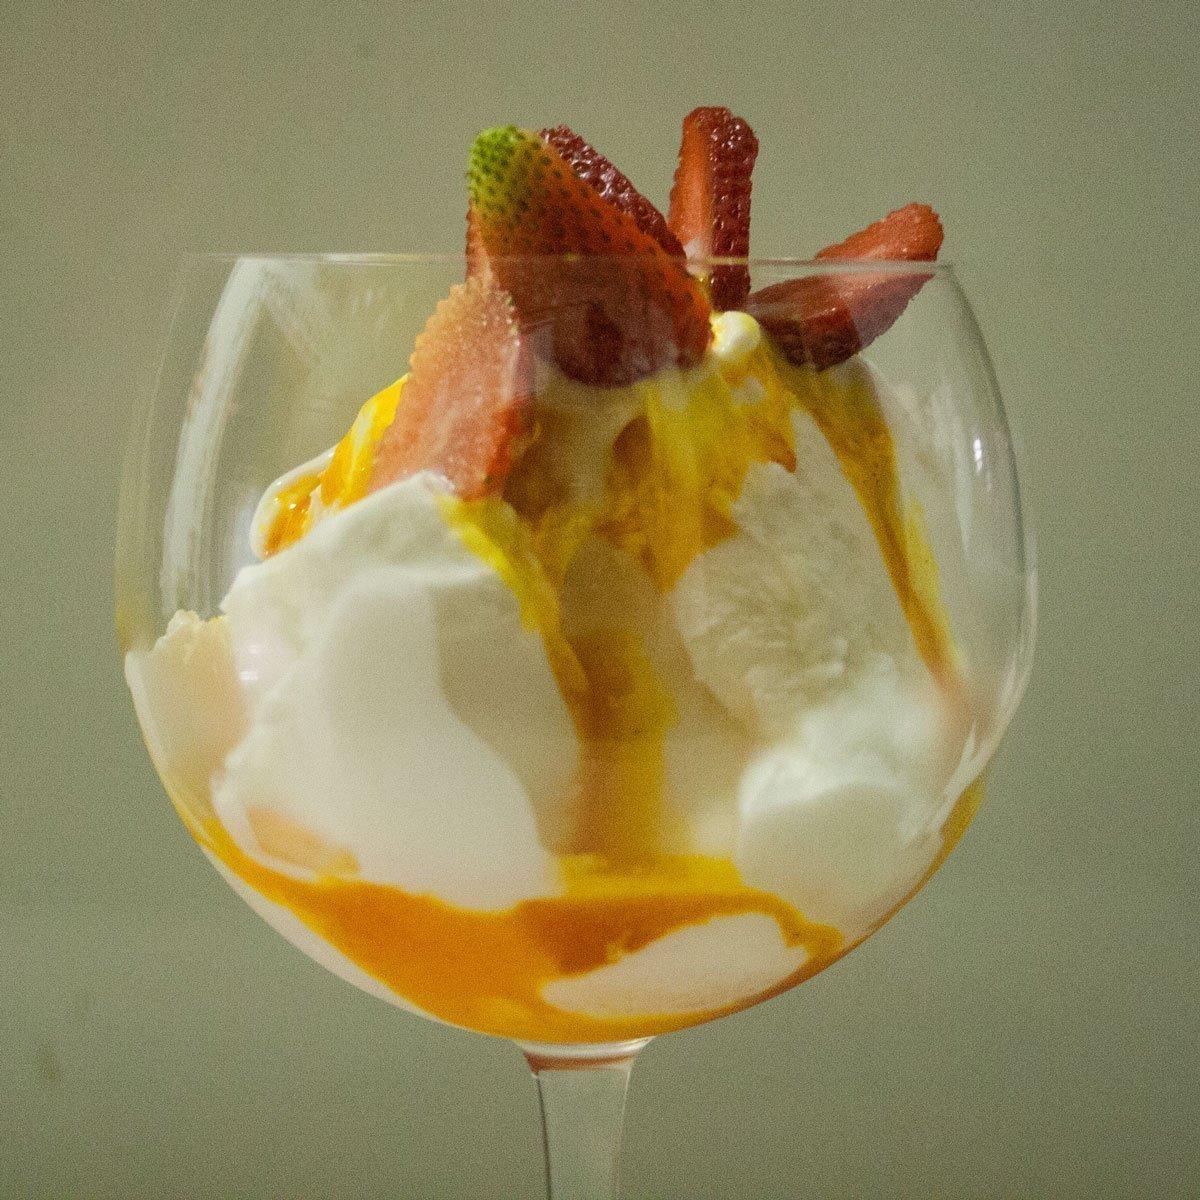 Saffron ice cream with strawberries